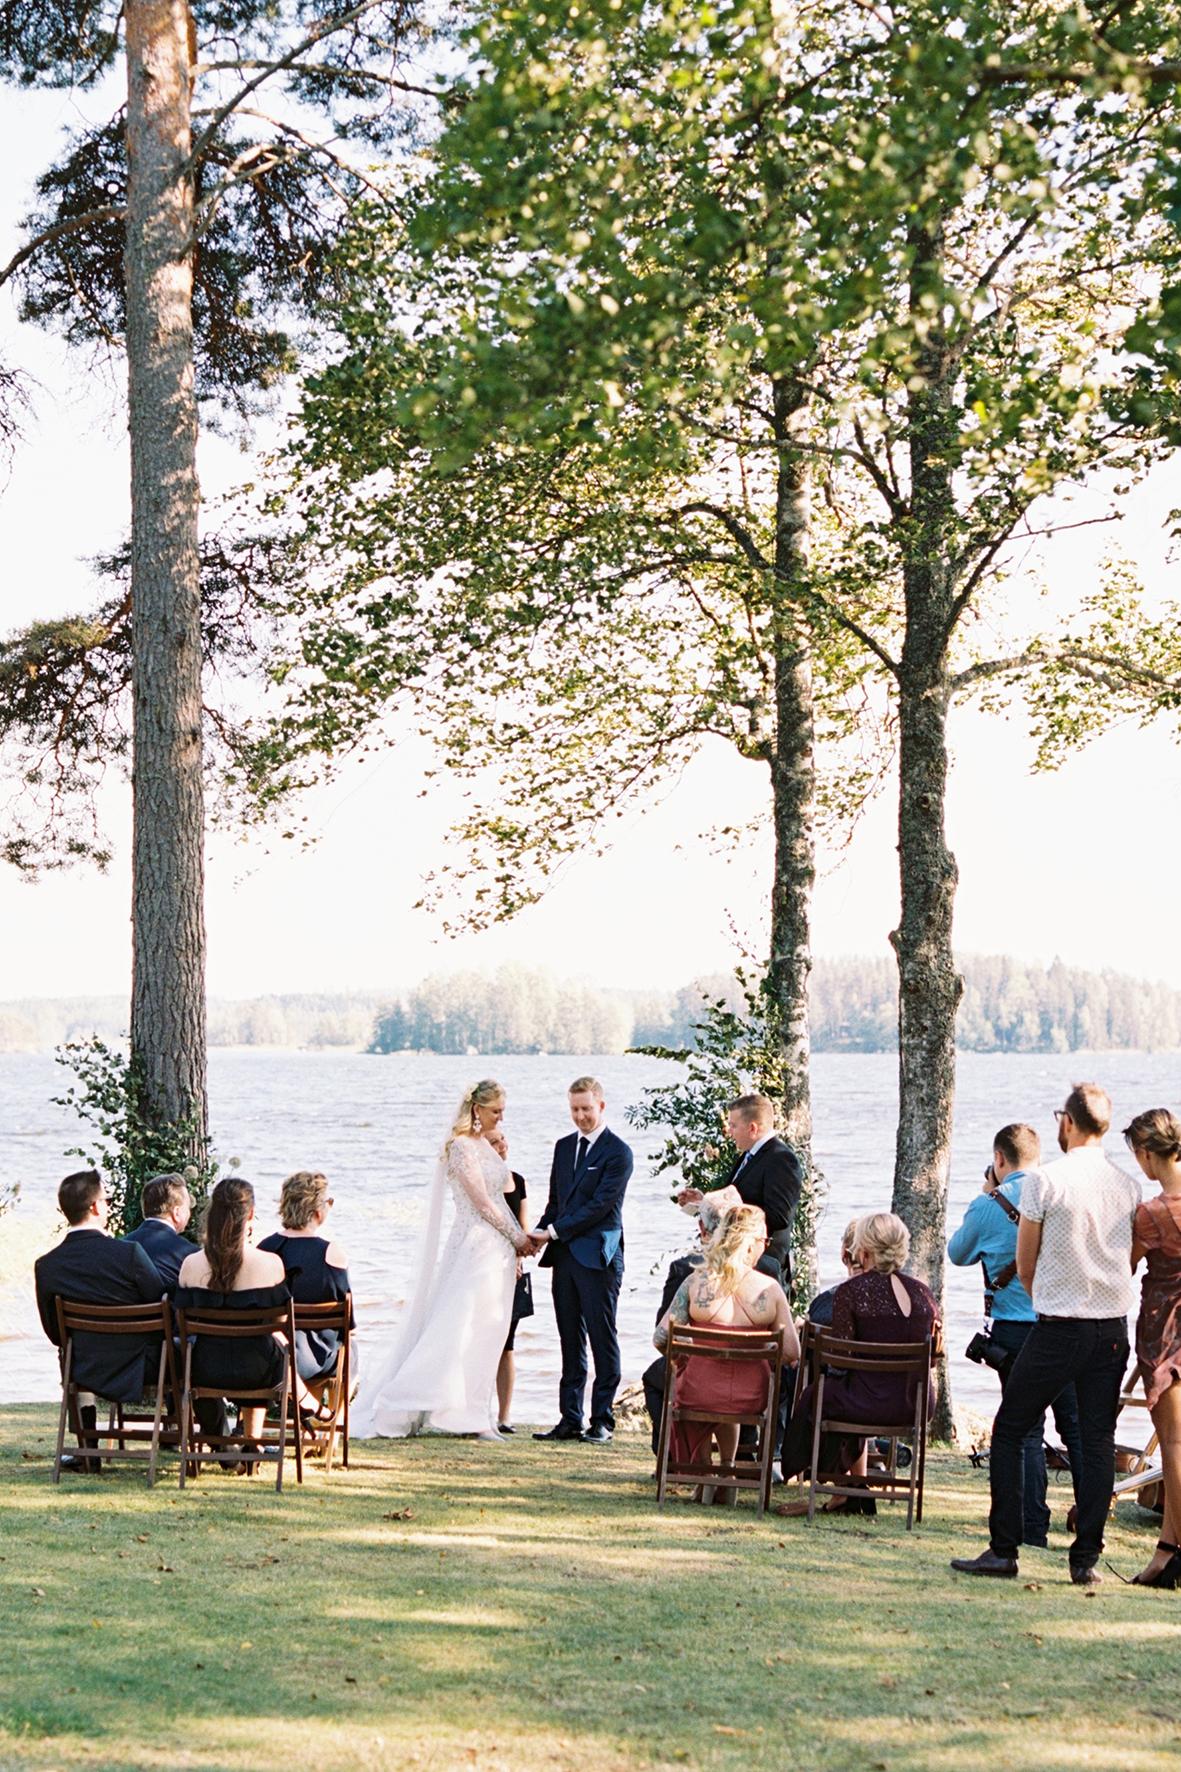 Jess & Jason's Intimate Elopement Wedding in Finland